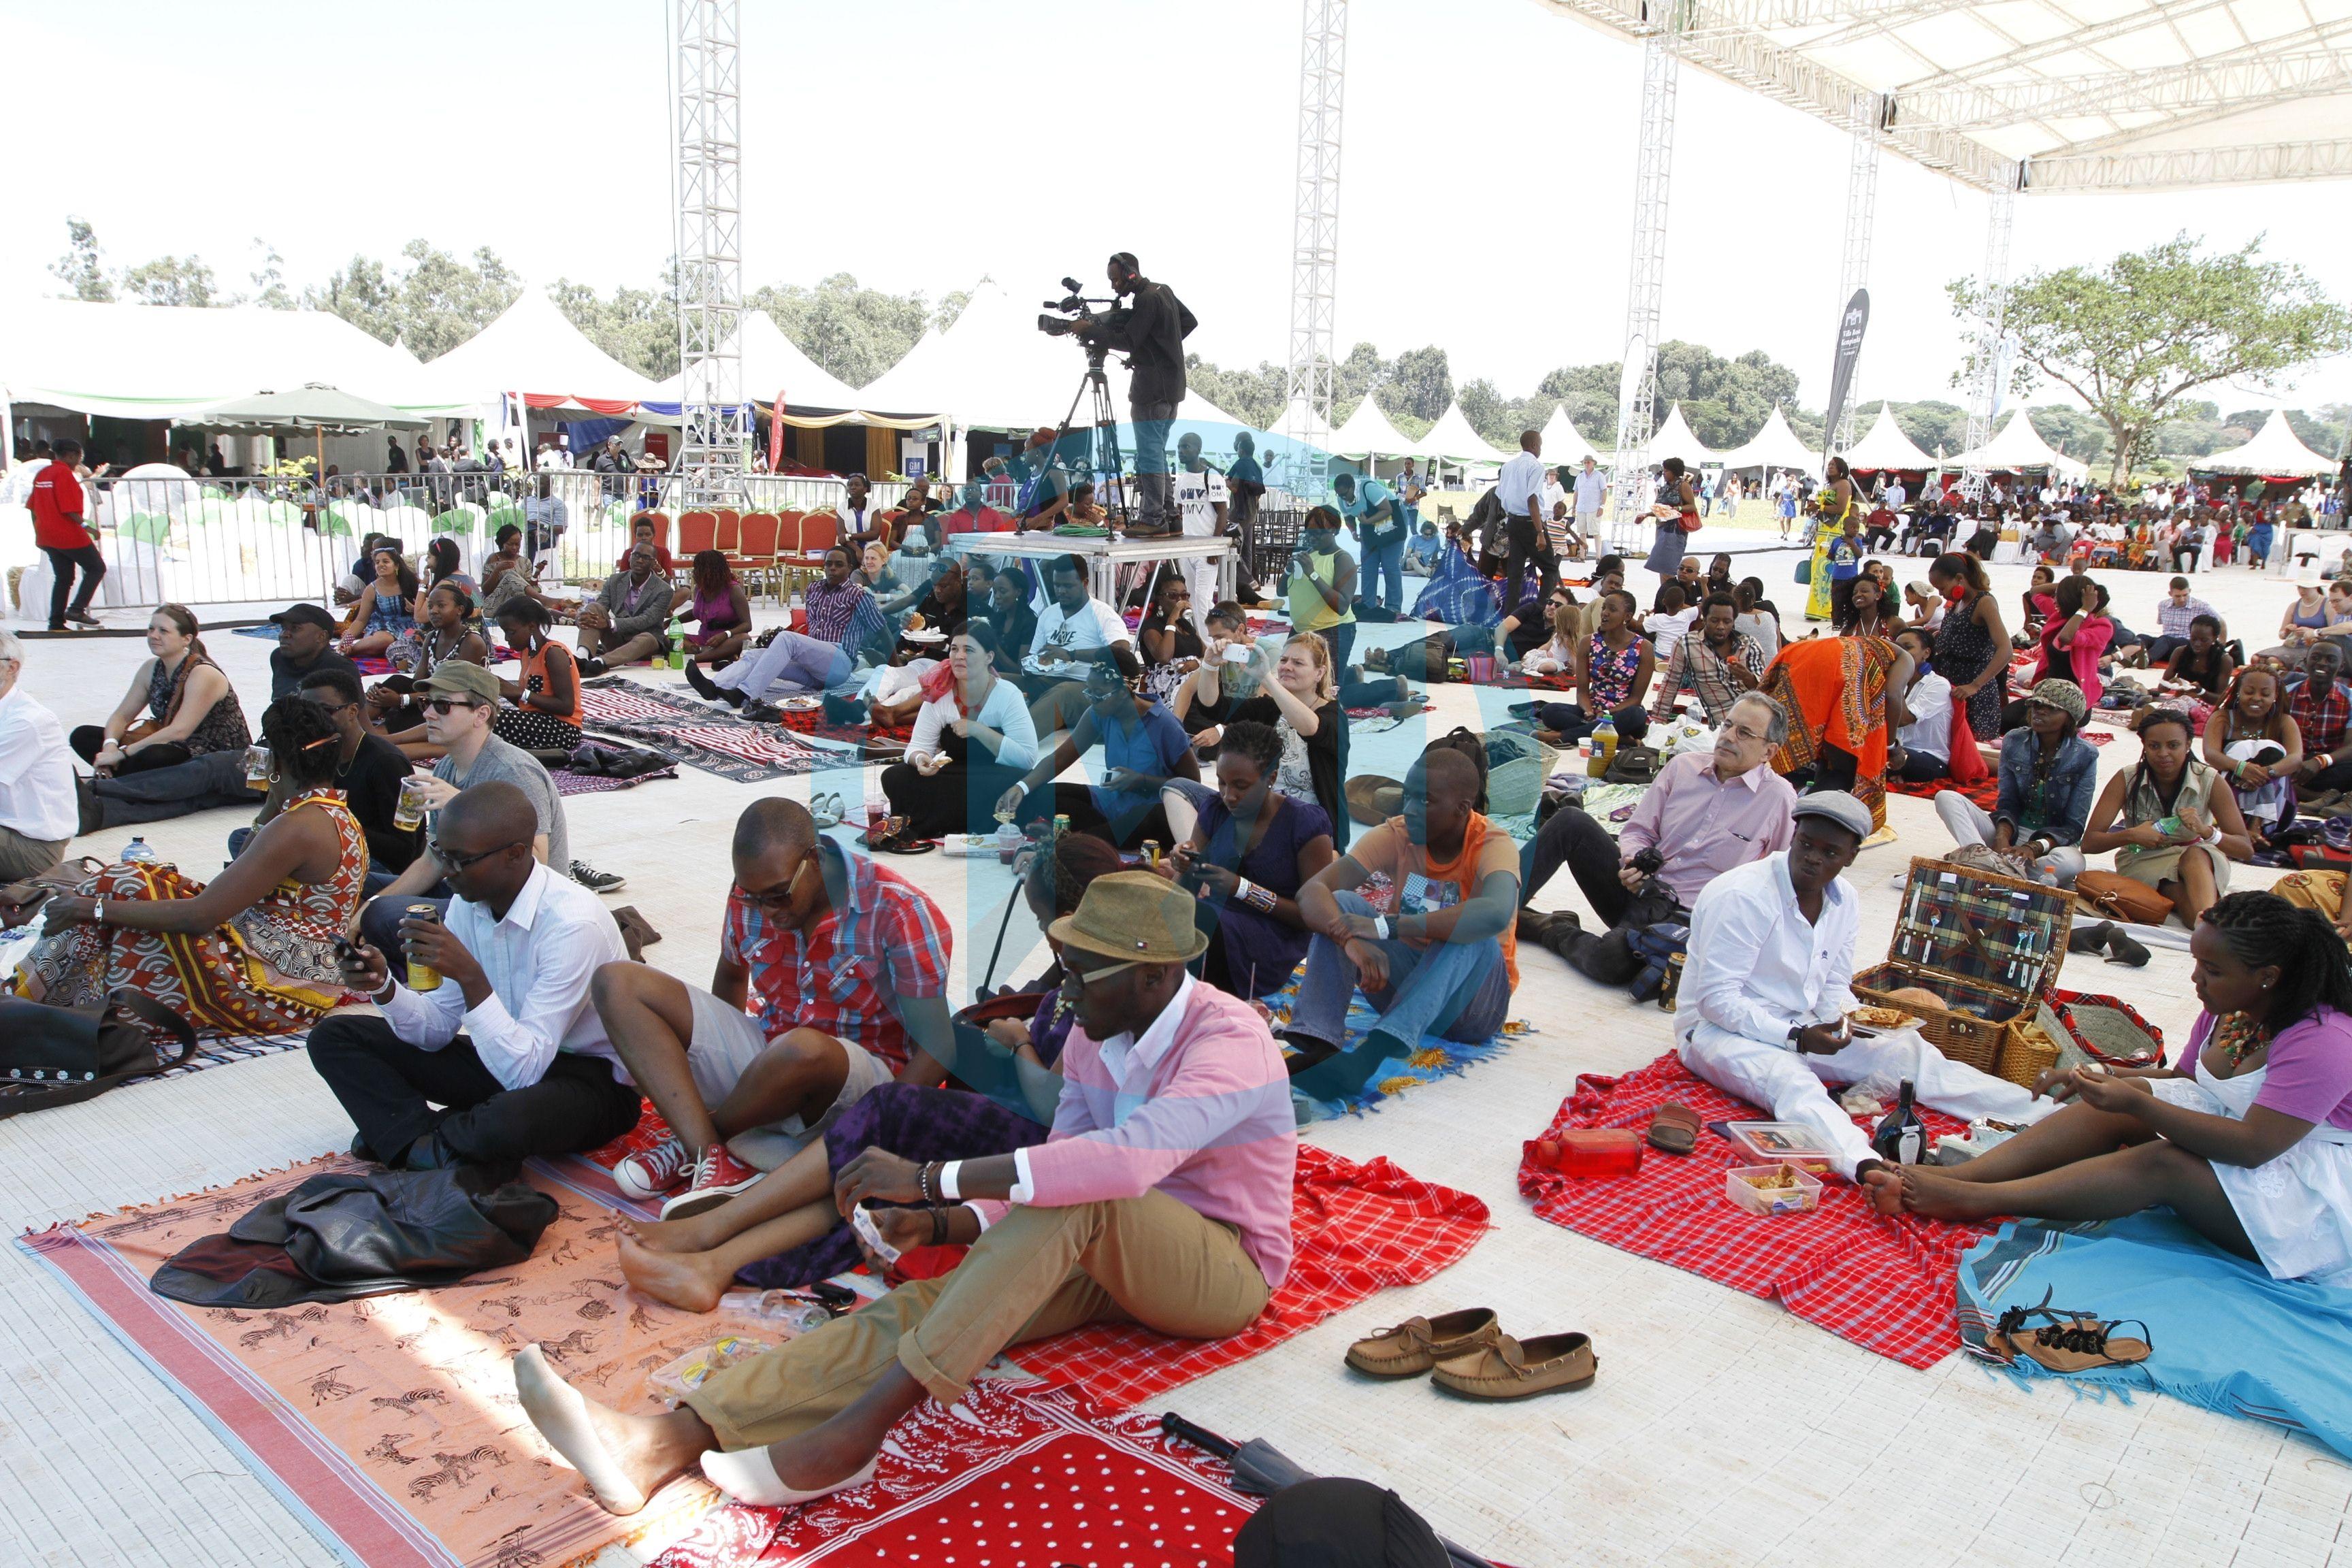 Safaricom international Jazz festival 2014 - Powered by Mosound Events